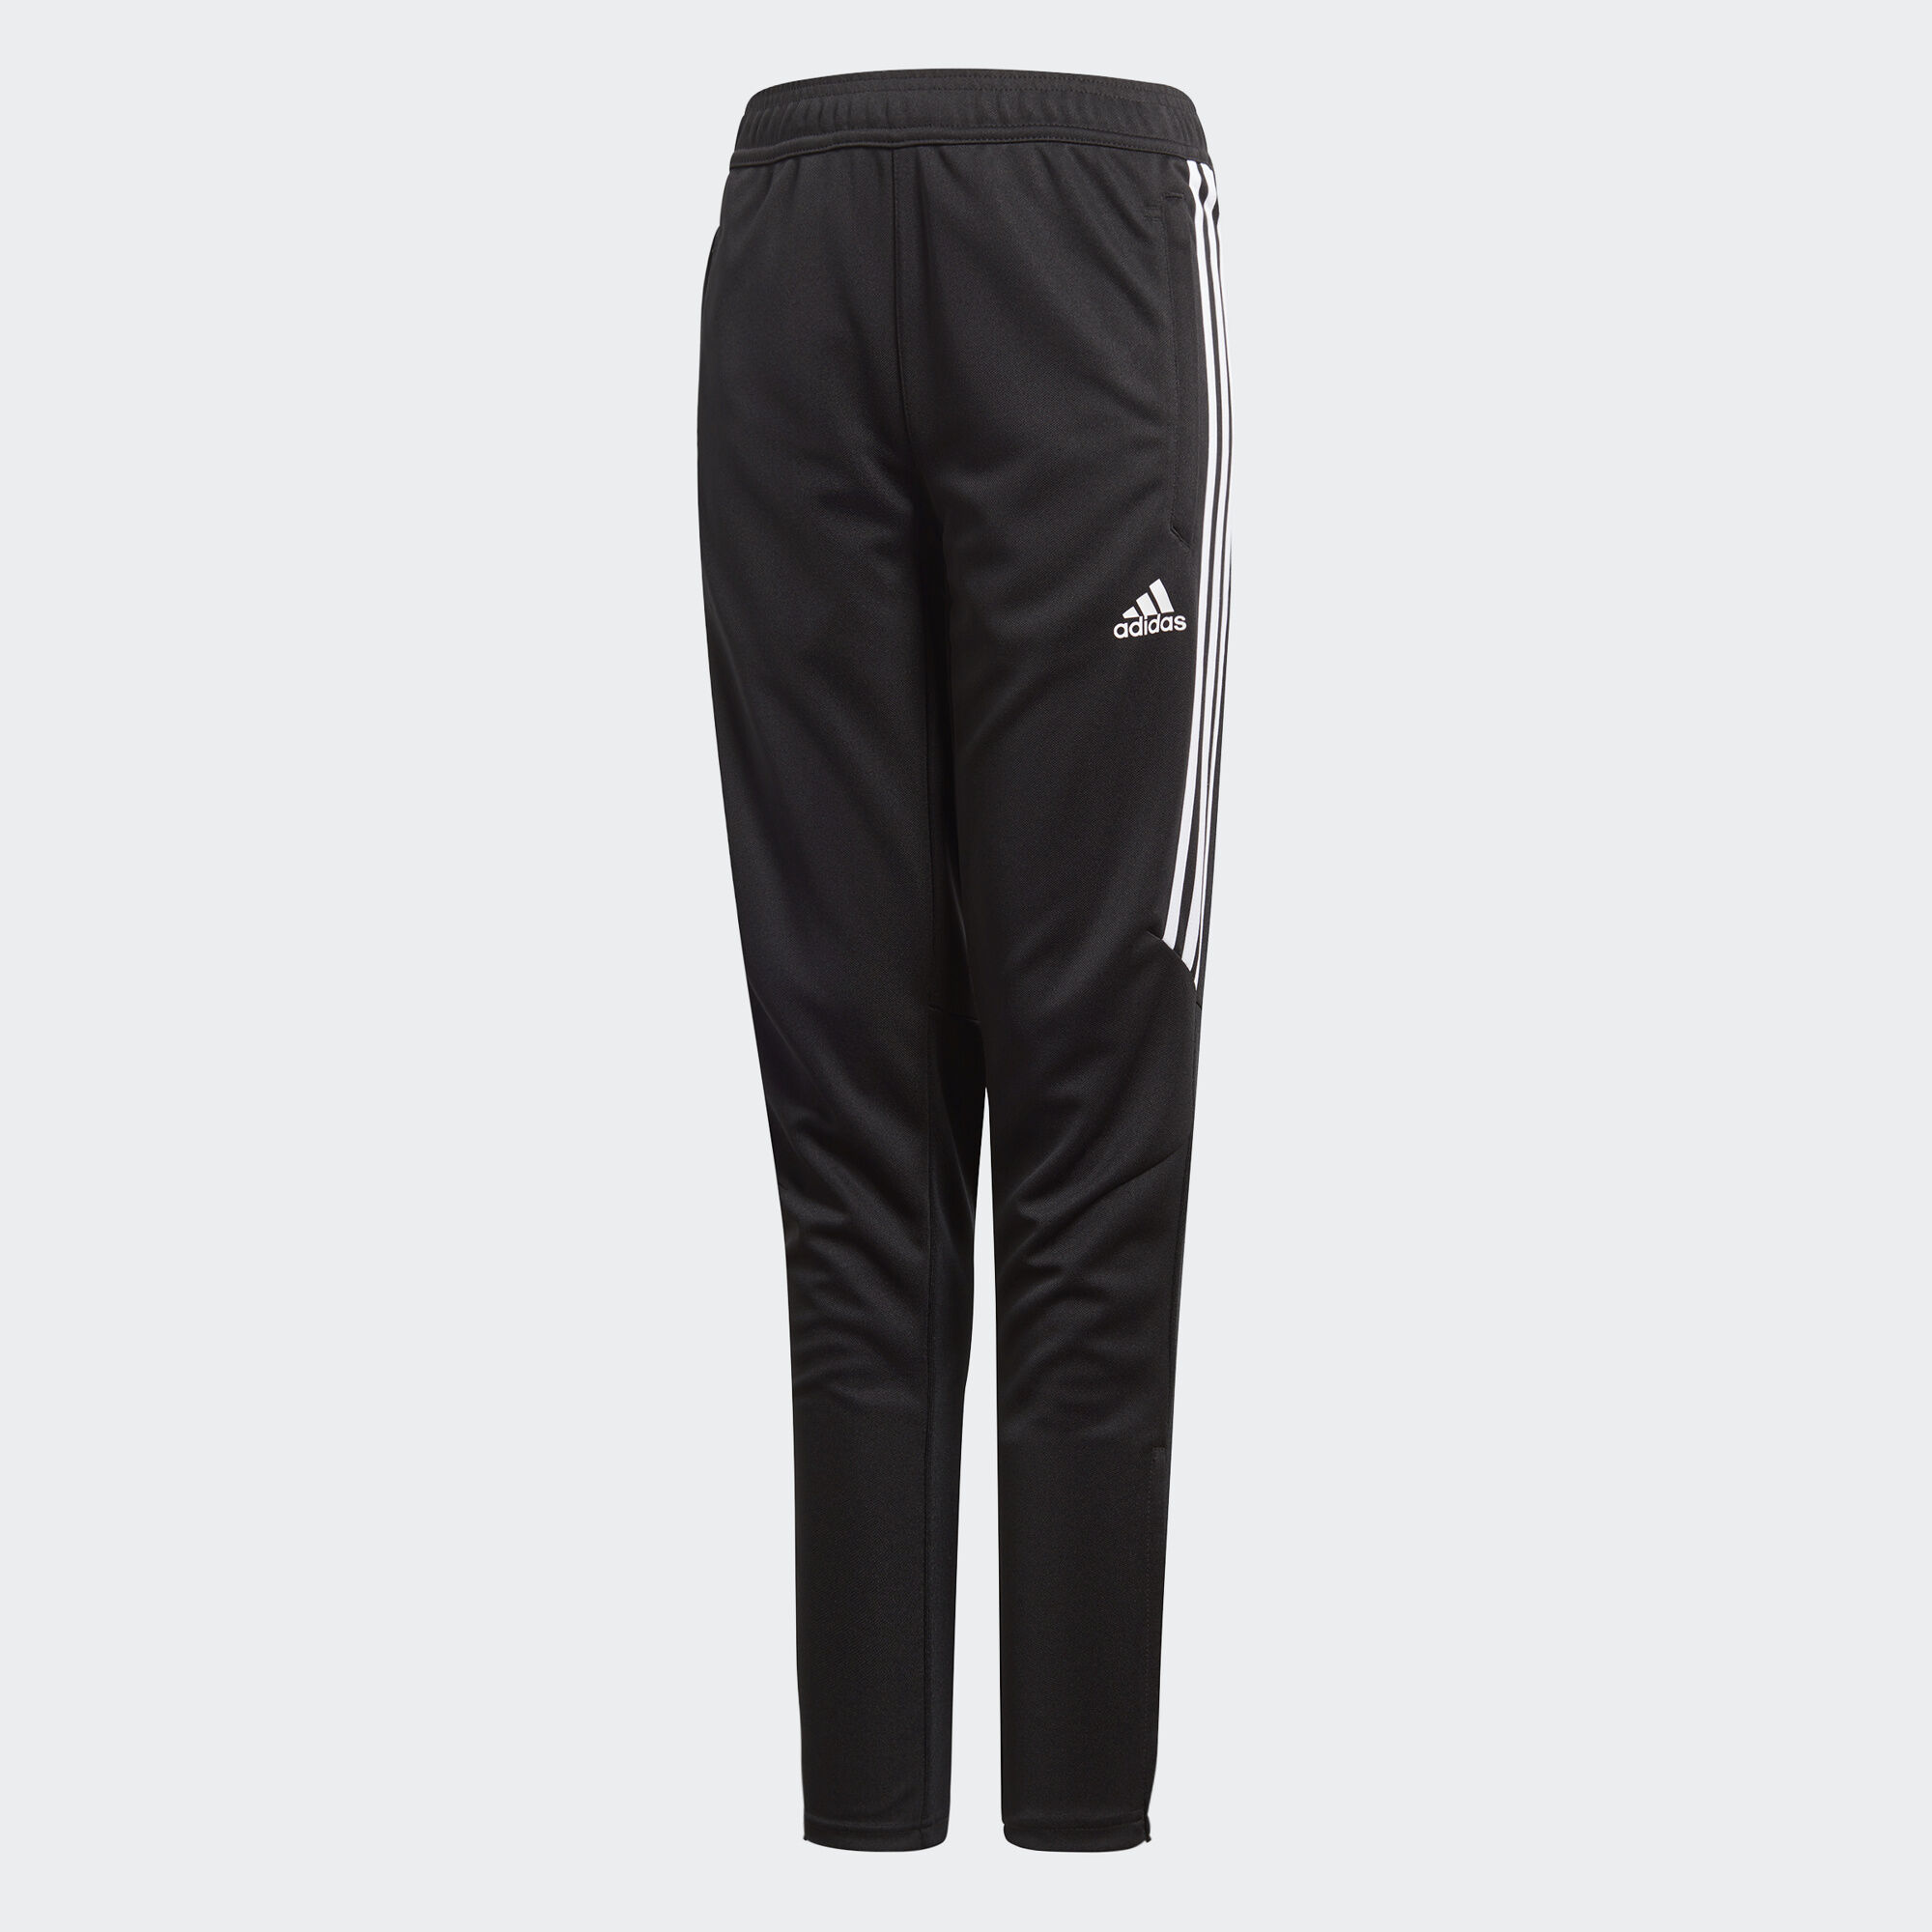 Stunning Adidas Tiro Training Pants Black Adidas Us Boys Athletic Pants Long Boys Athletic Pants Size 7 houzz-02 Boys Athletic Pants